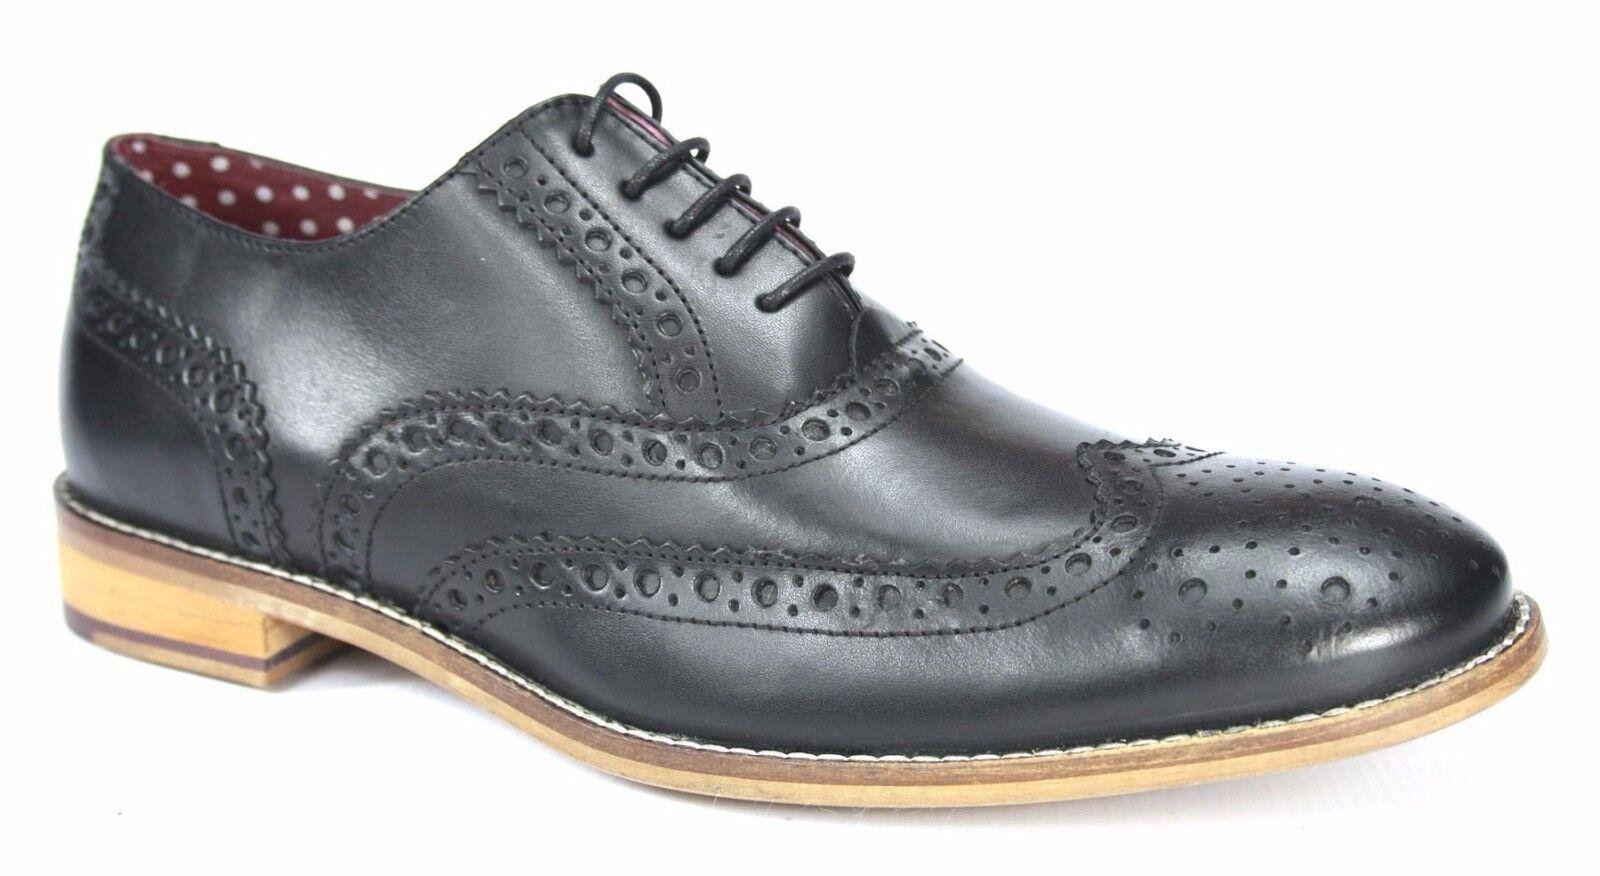 vendite calde Londra Londra Londra Brogues GATSBY Uomo LEATHER Wingtip scarpe formali nero  comodamente